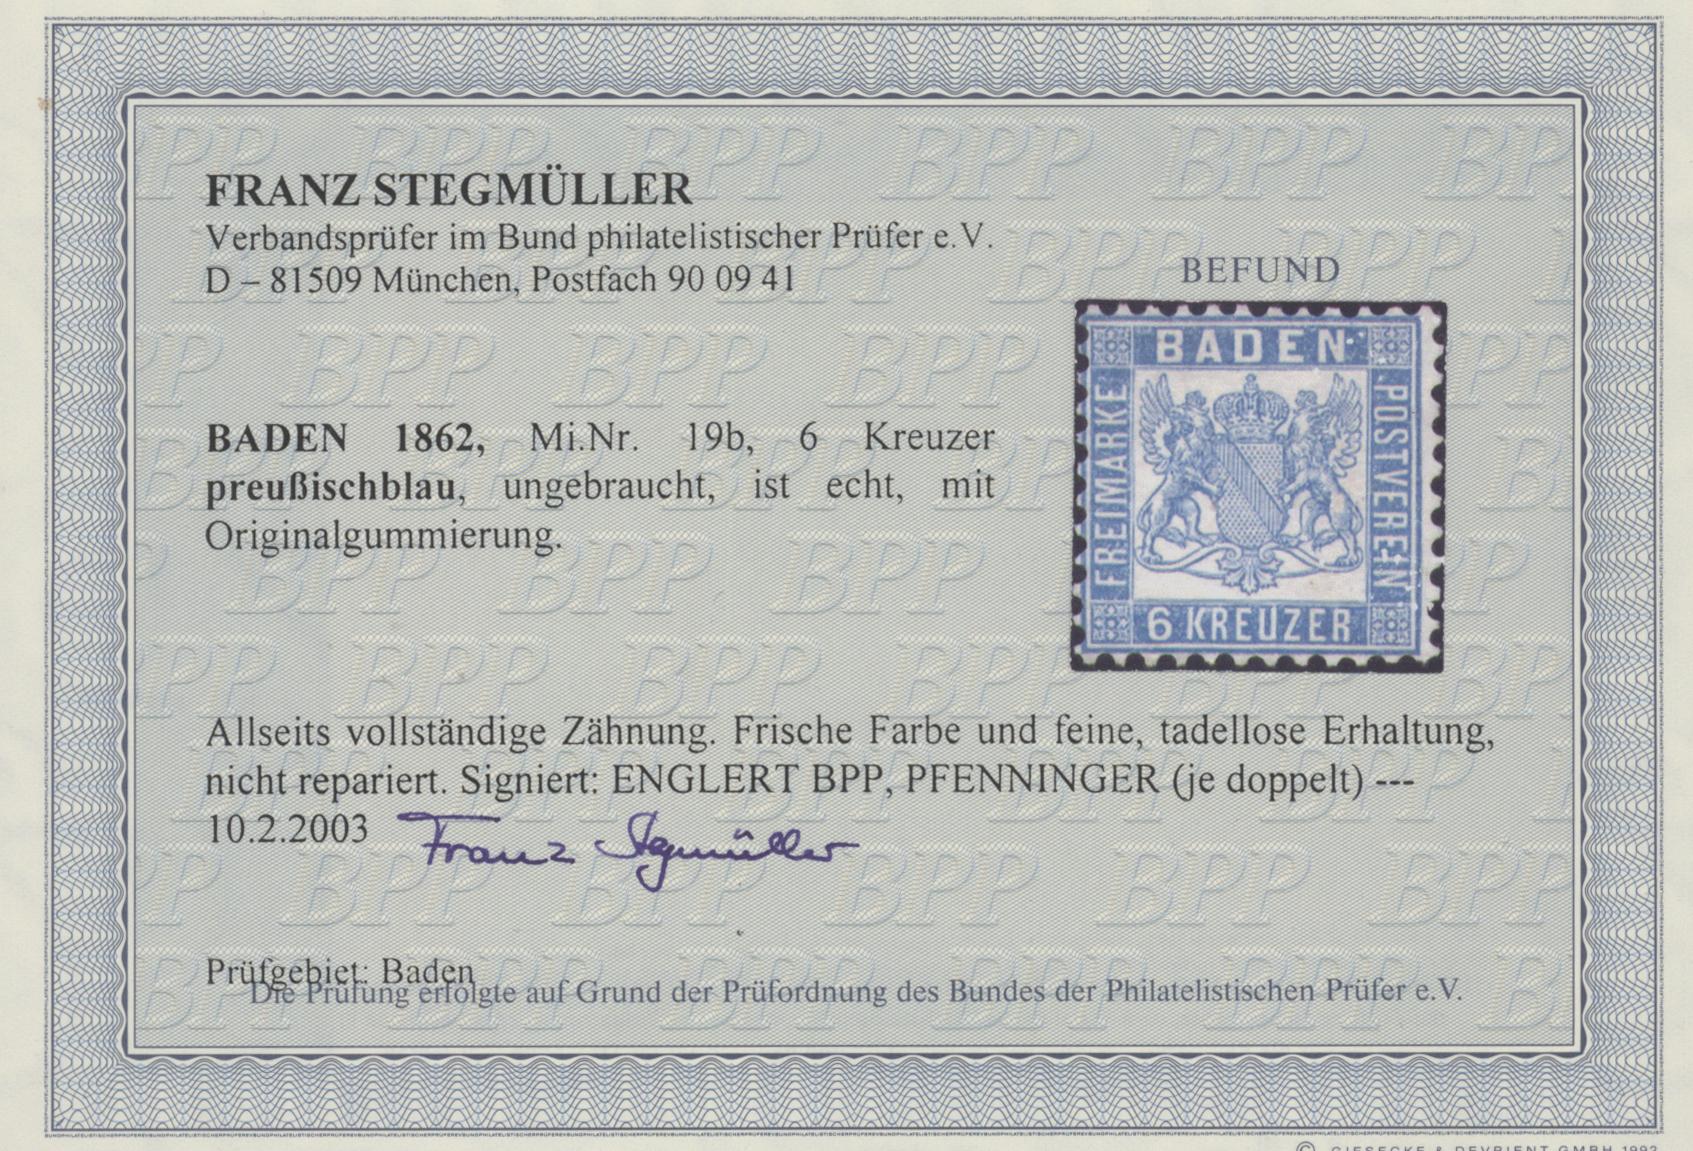 Lot 28144 - Baden - Marken und Briefe  -  Auktionshaus Christoph Gärtner GmbH & Co. KG Sale #46 Gollcetions Germany - including the suplement